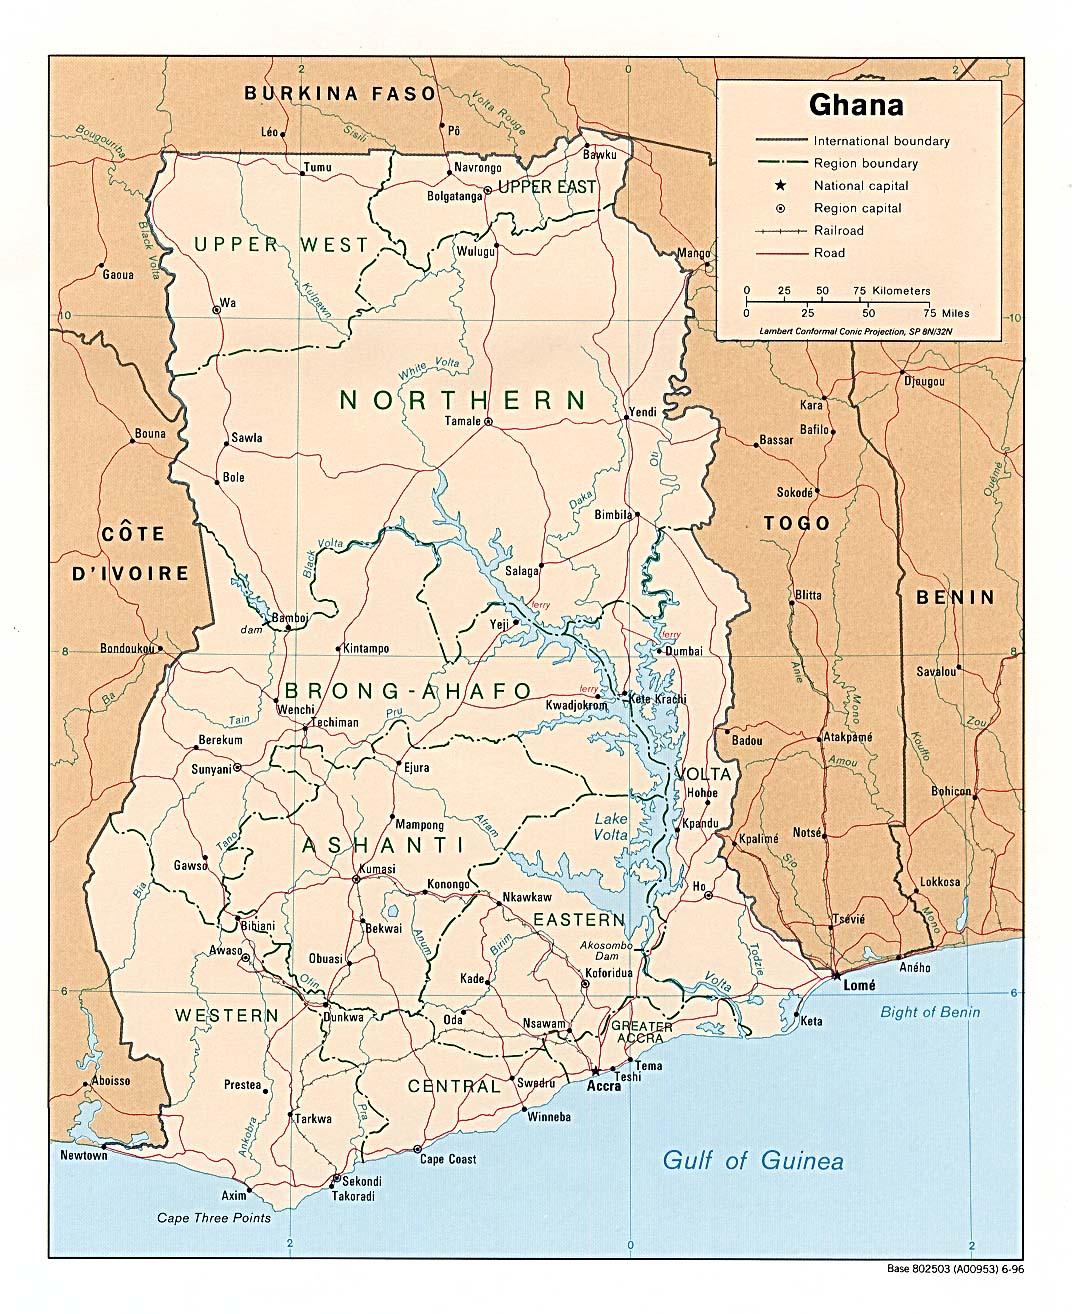 Mapa Politico de Ghana